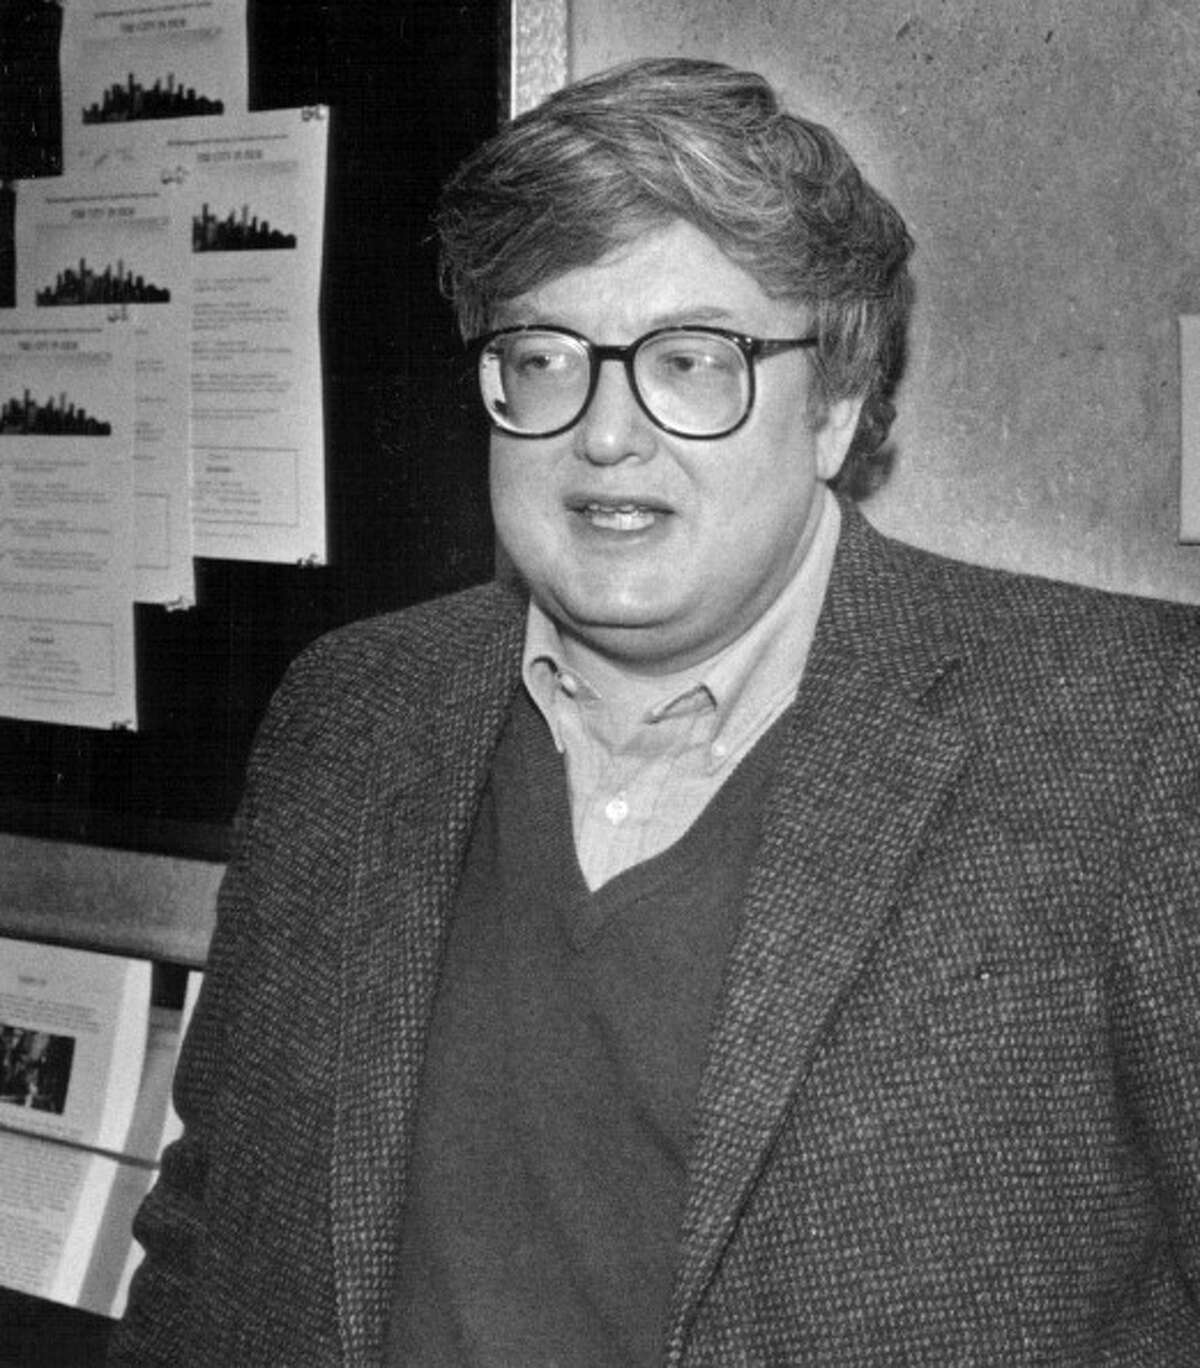 Roger Ebert -- generous colleague, legendary critic, gallant man.